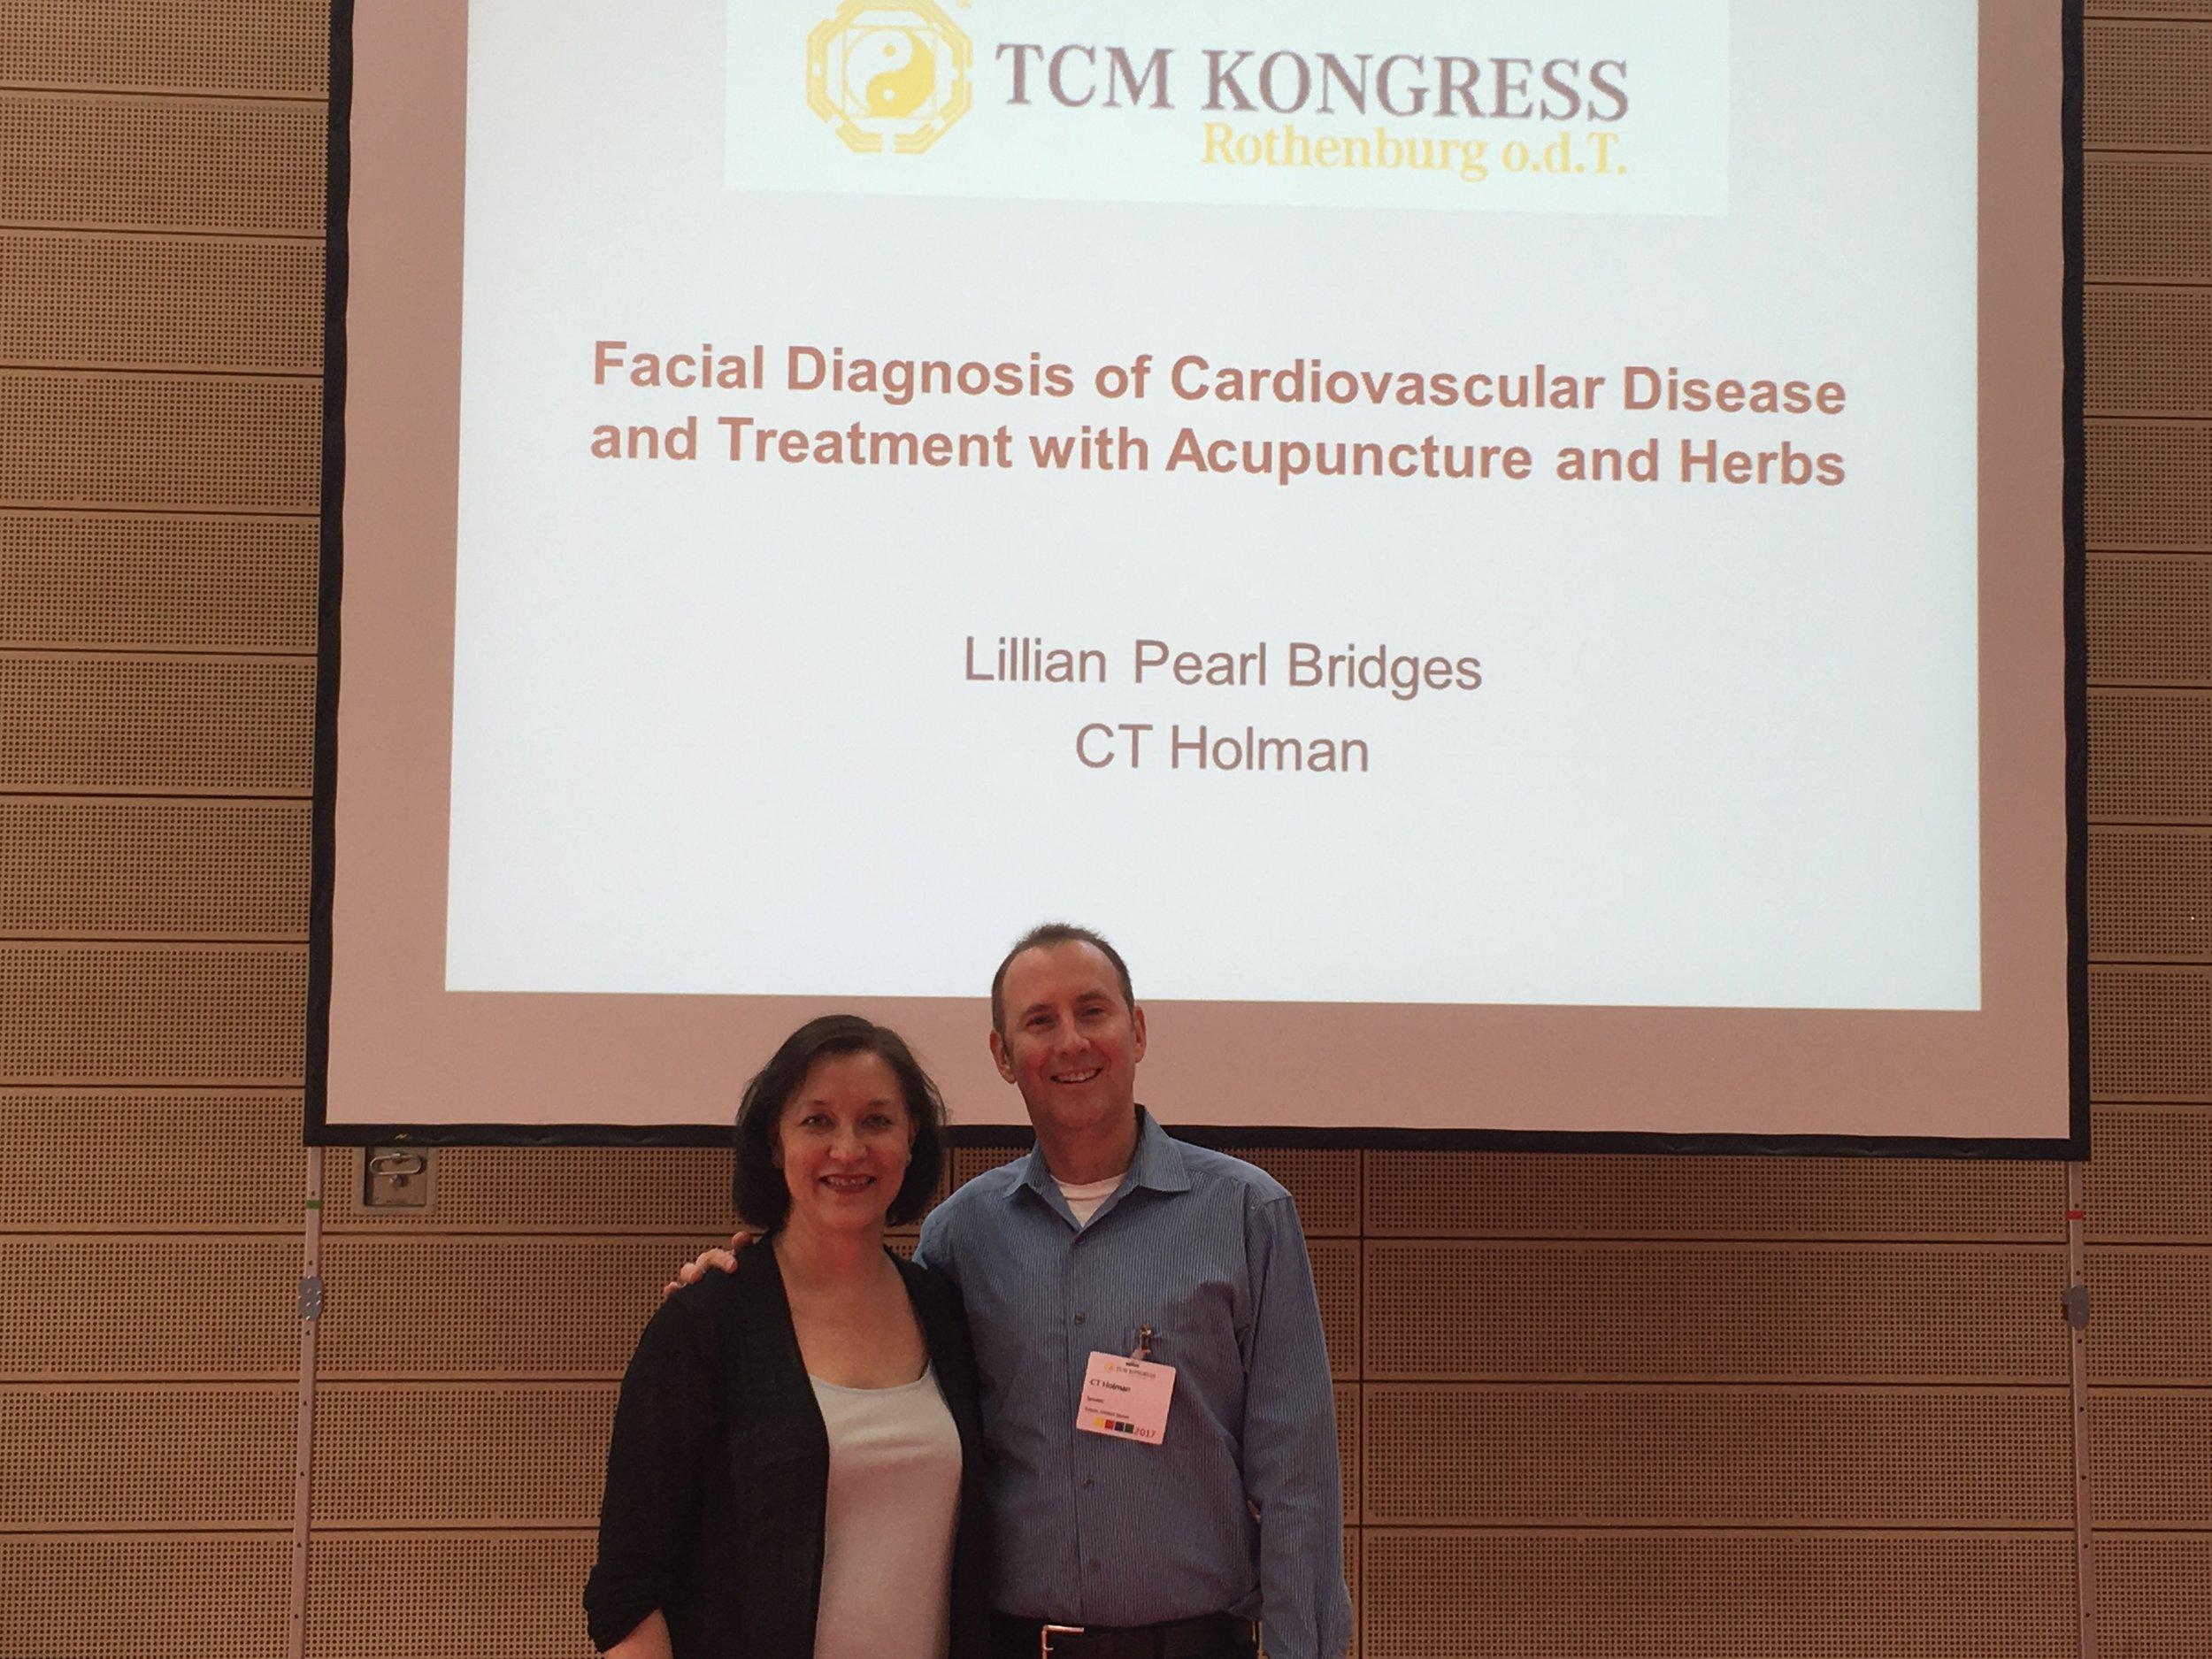 Teaching Cardiology with Lillian Bridges at the 2017 Rothenburg Kongress.